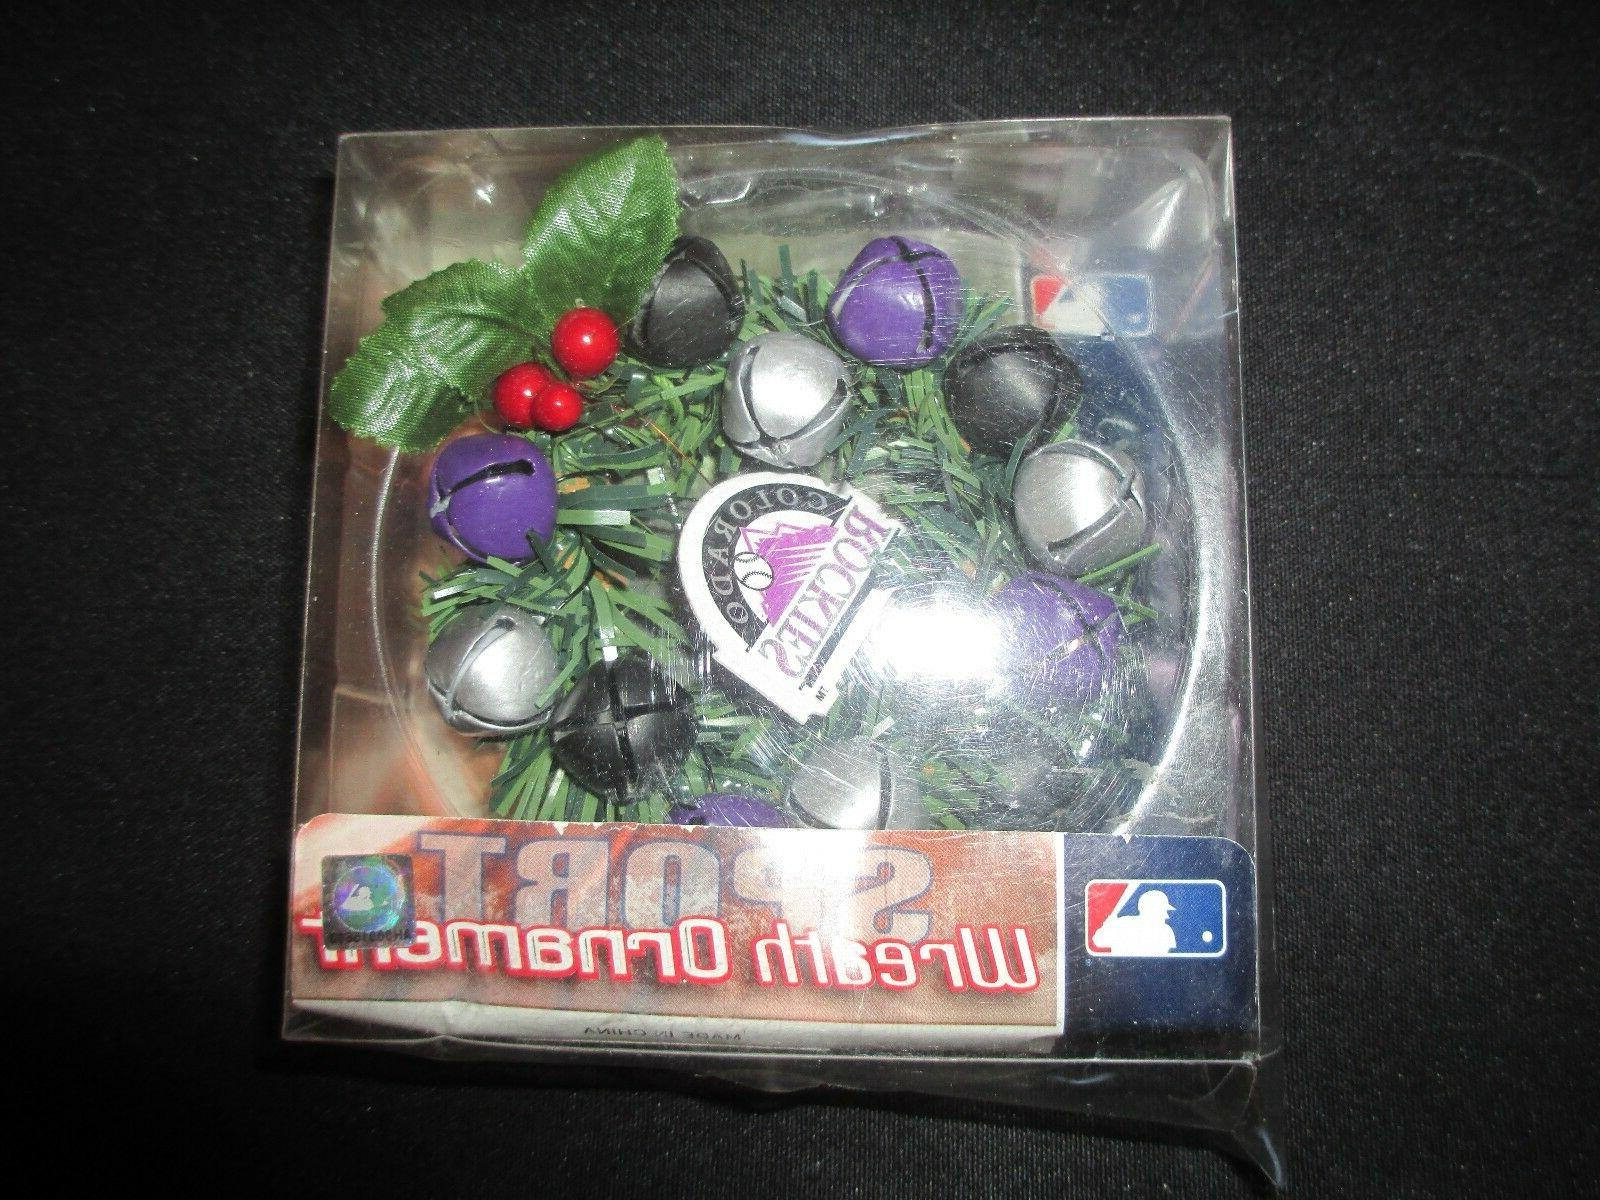 colorado rockies wreath christmas ornament new in